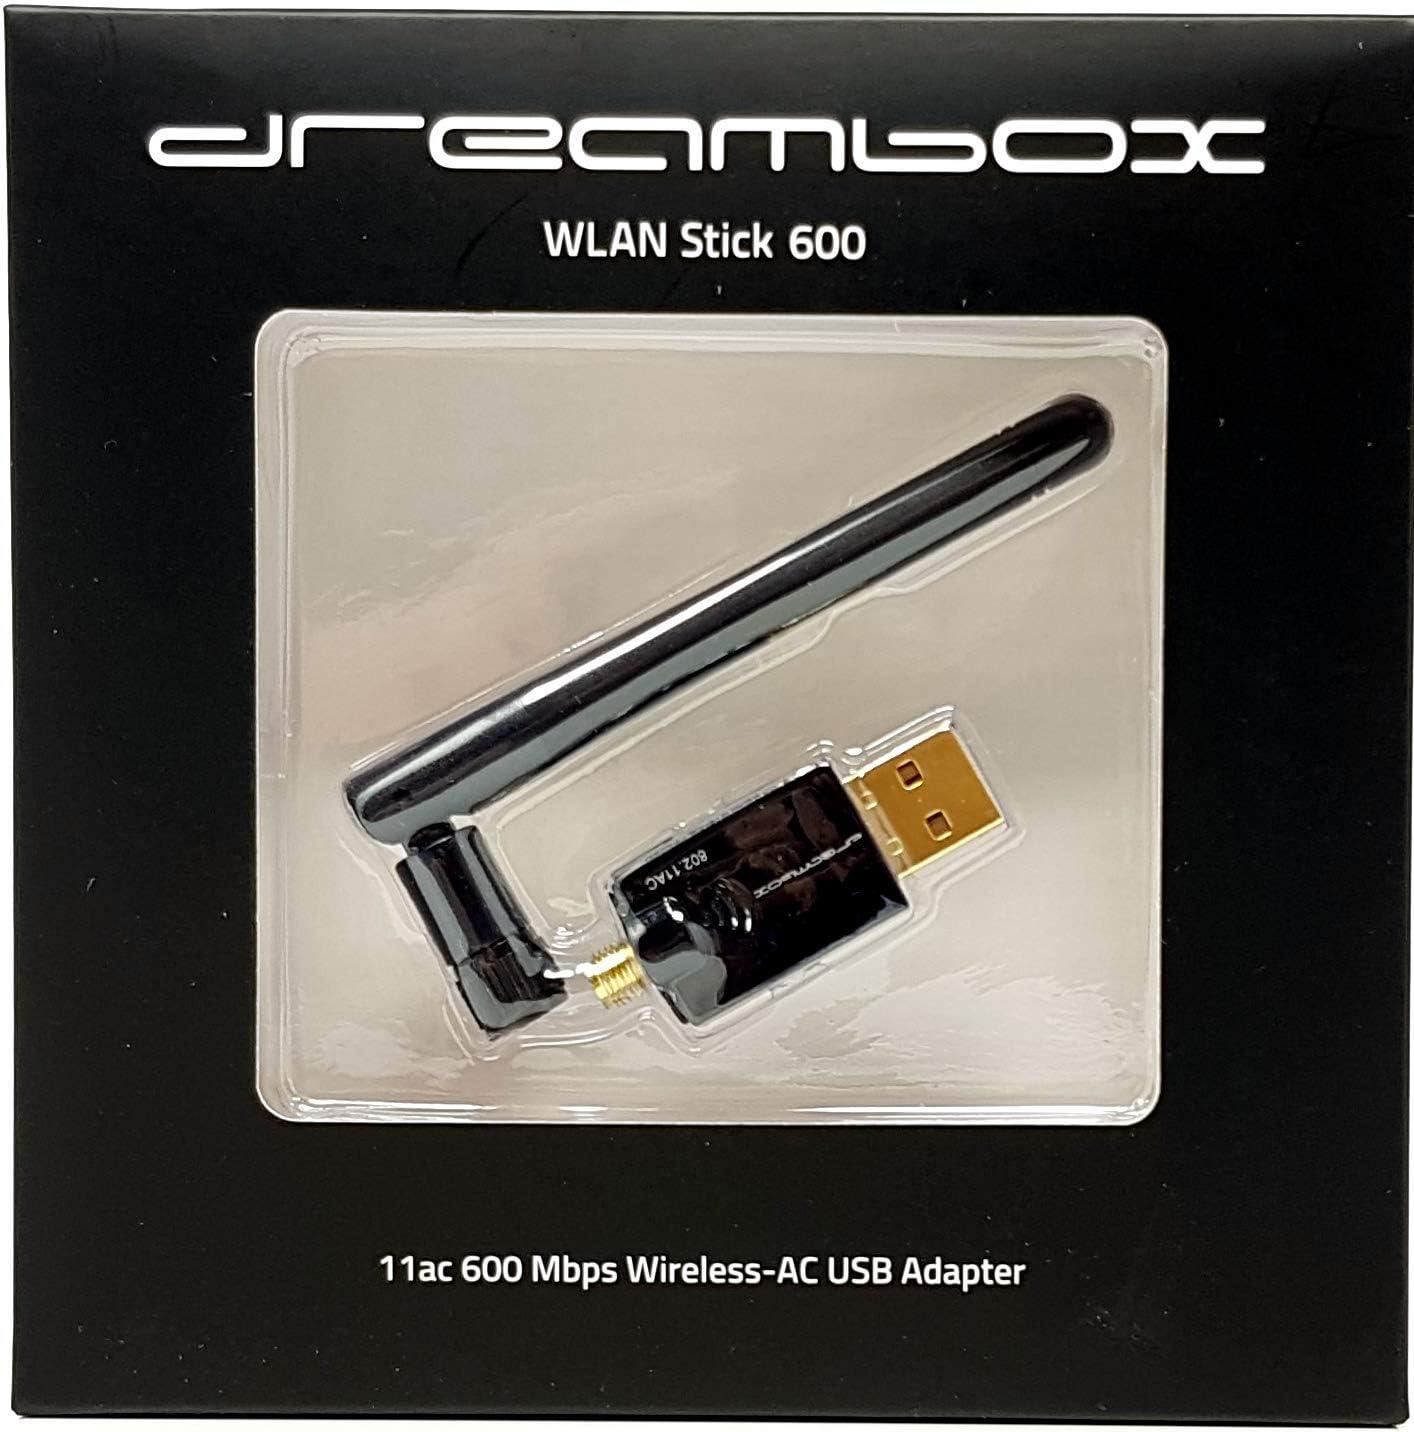 Dreambox Wireless 600mbit S Usb Wi Fi Stick With Elektronik